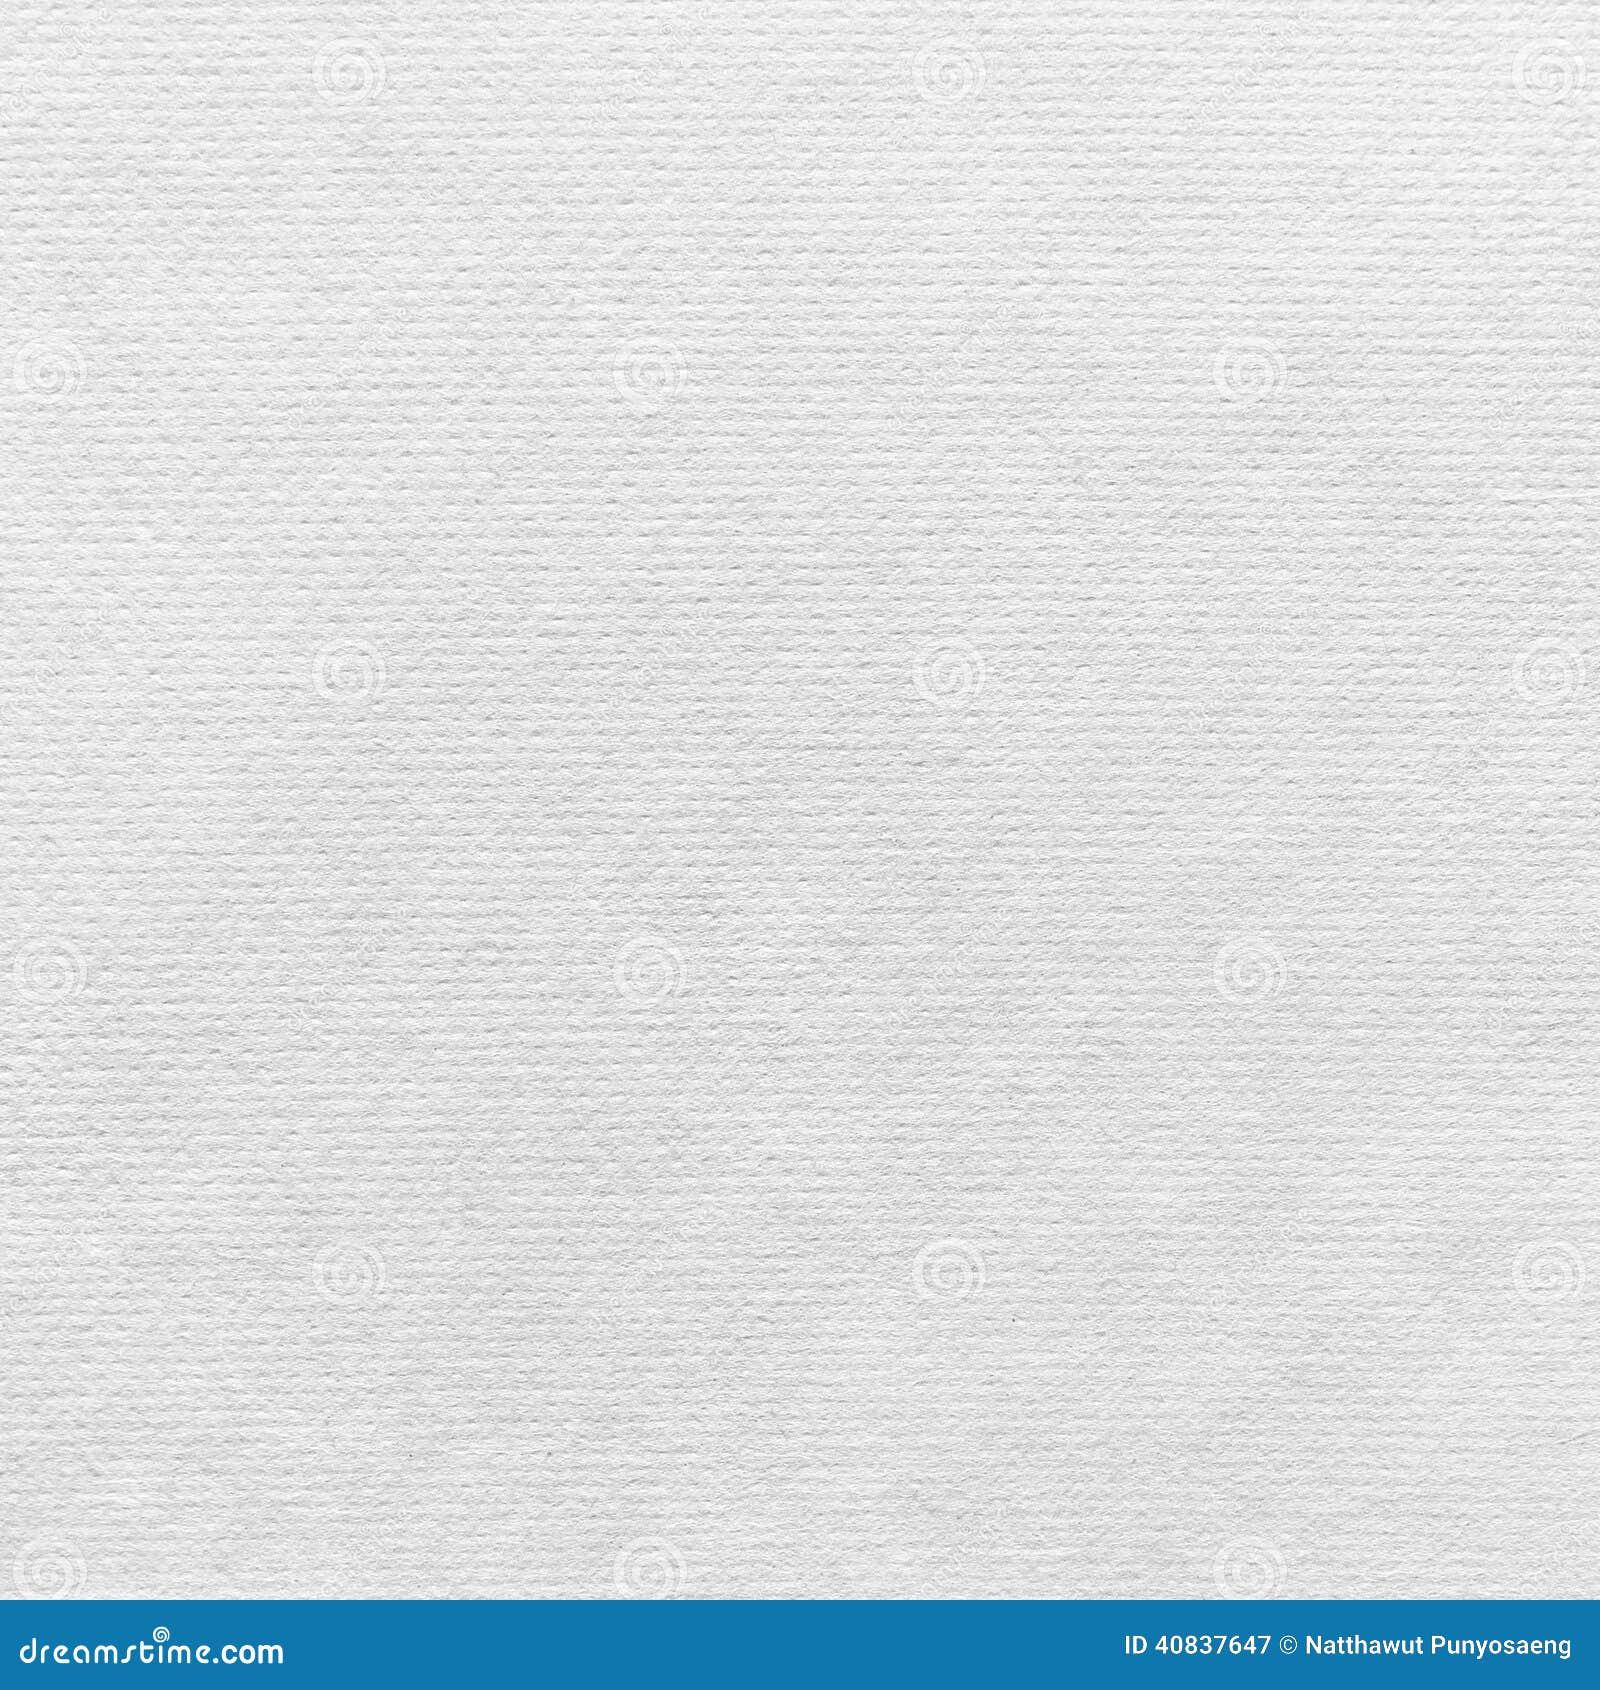 Seamless White Paper Texture